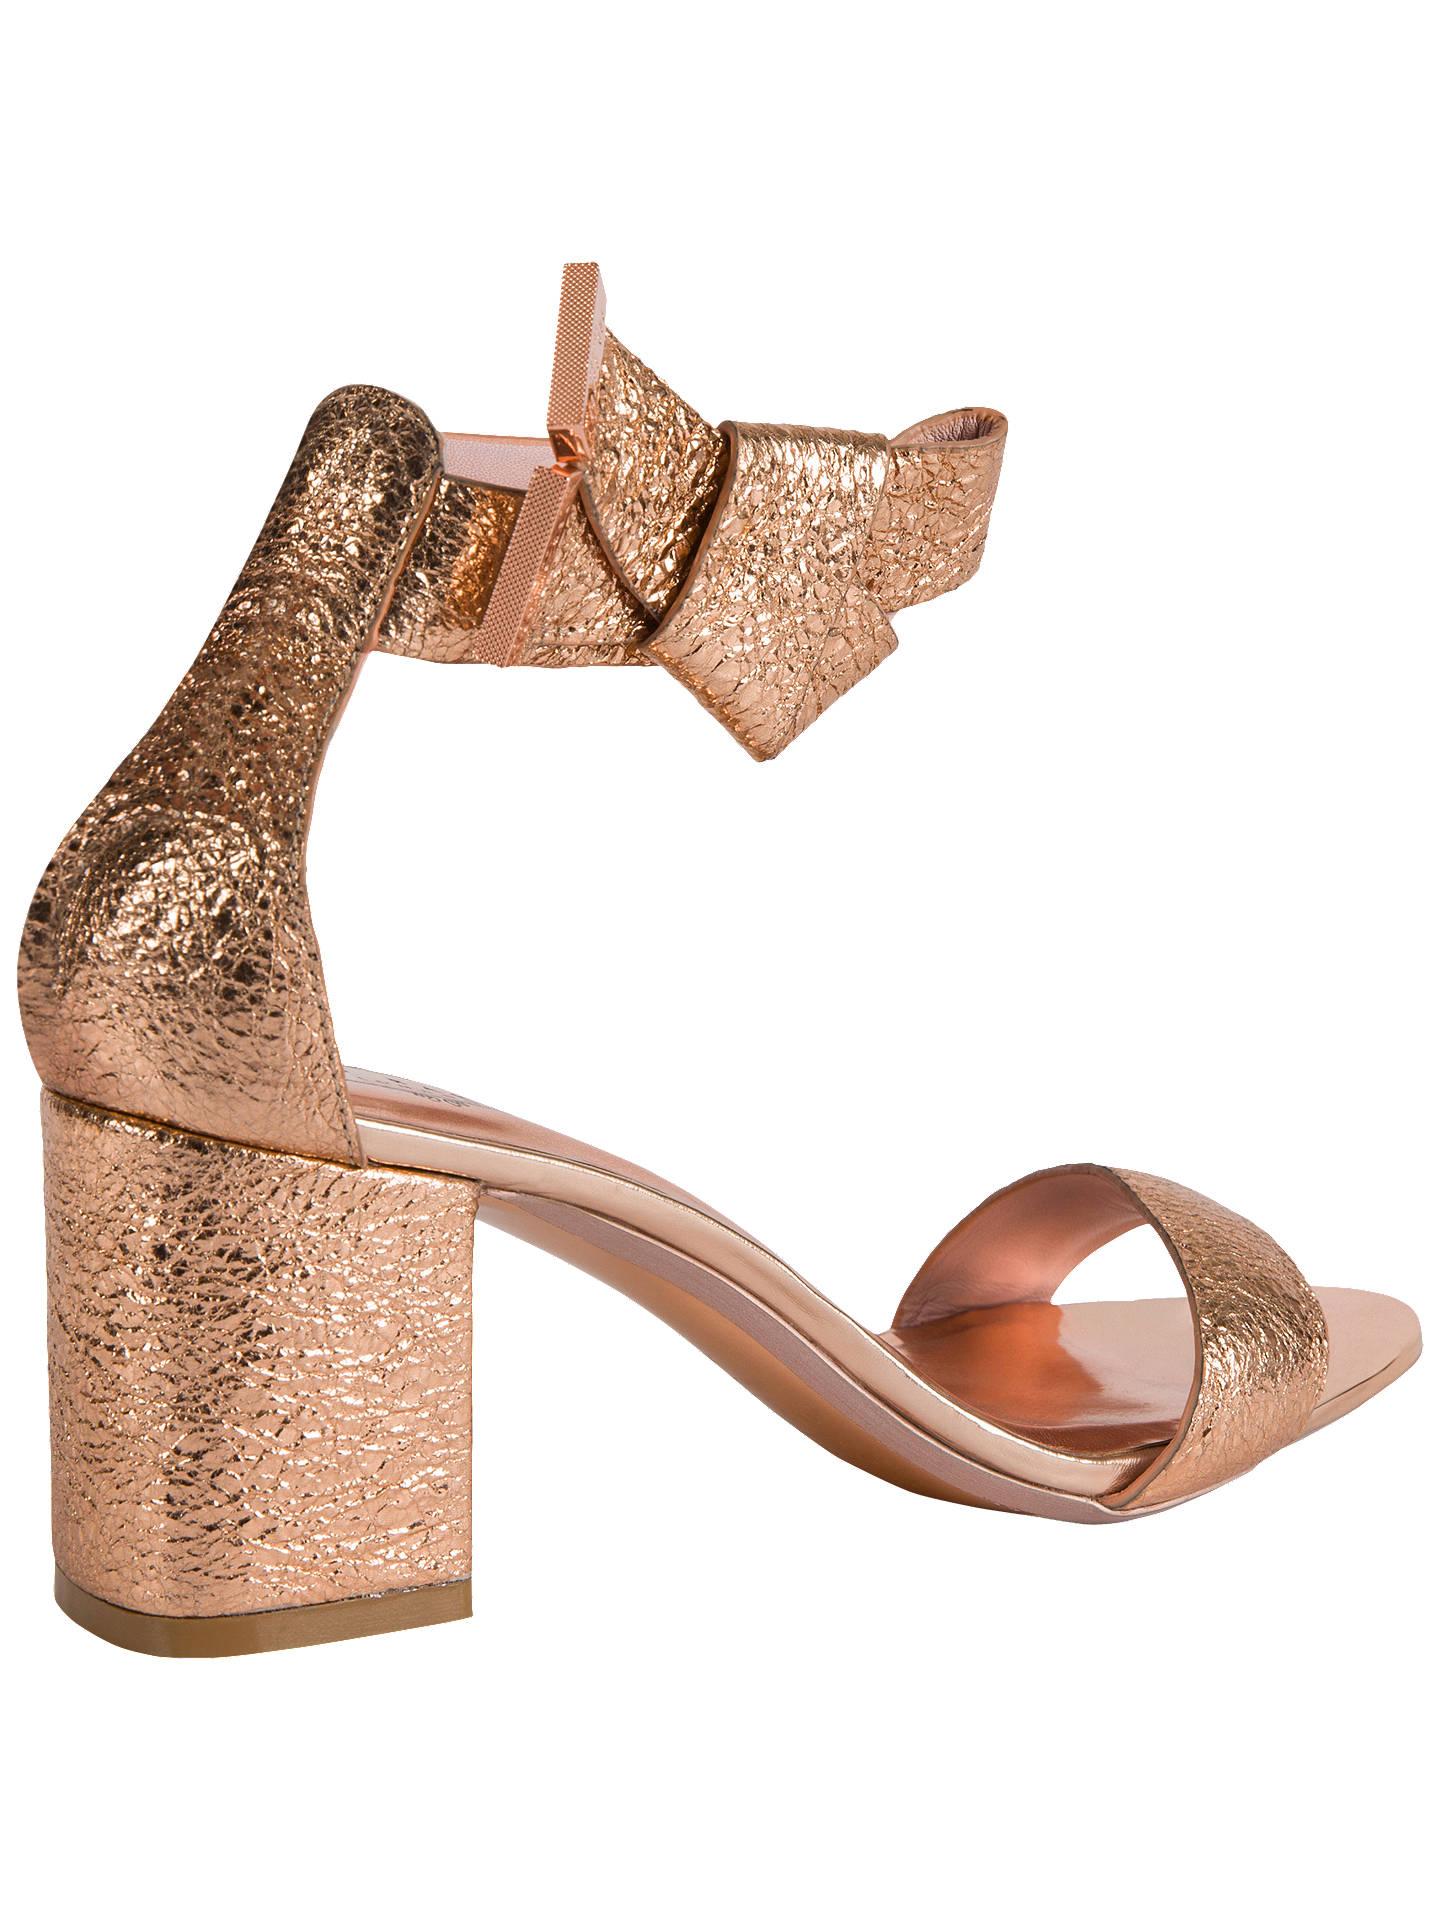 63e58c72cc7 Buy Ted Baker Kerria Block Heeled Sandals